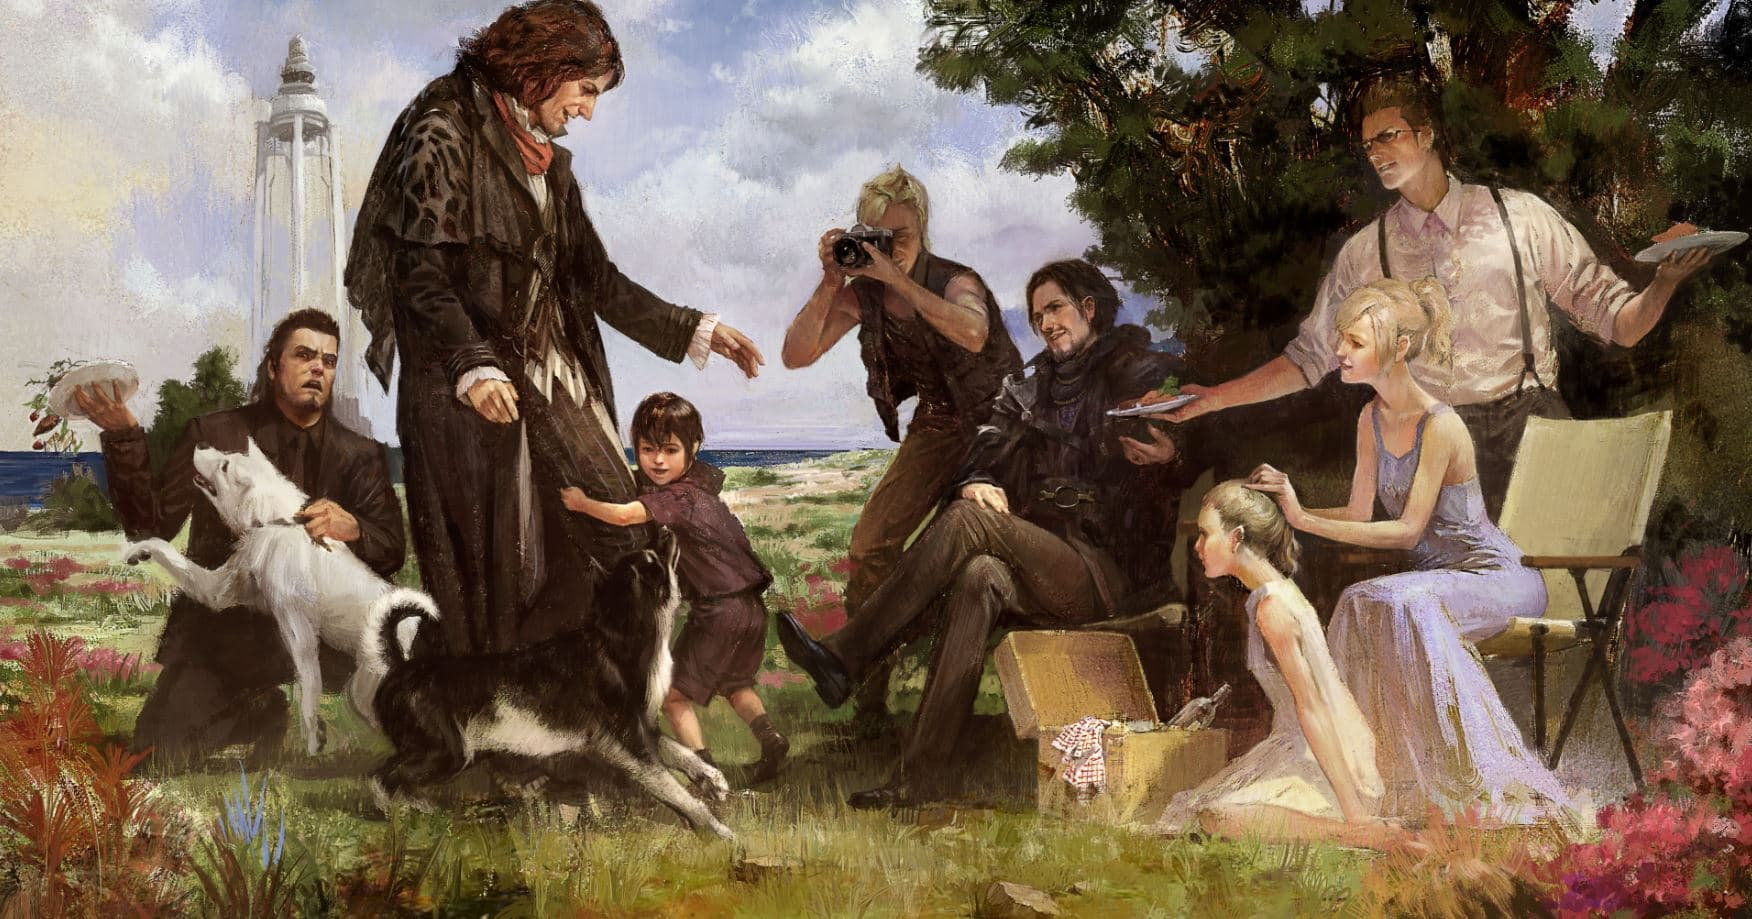 Final Fantasy XV - Episode Side Story: Aranea